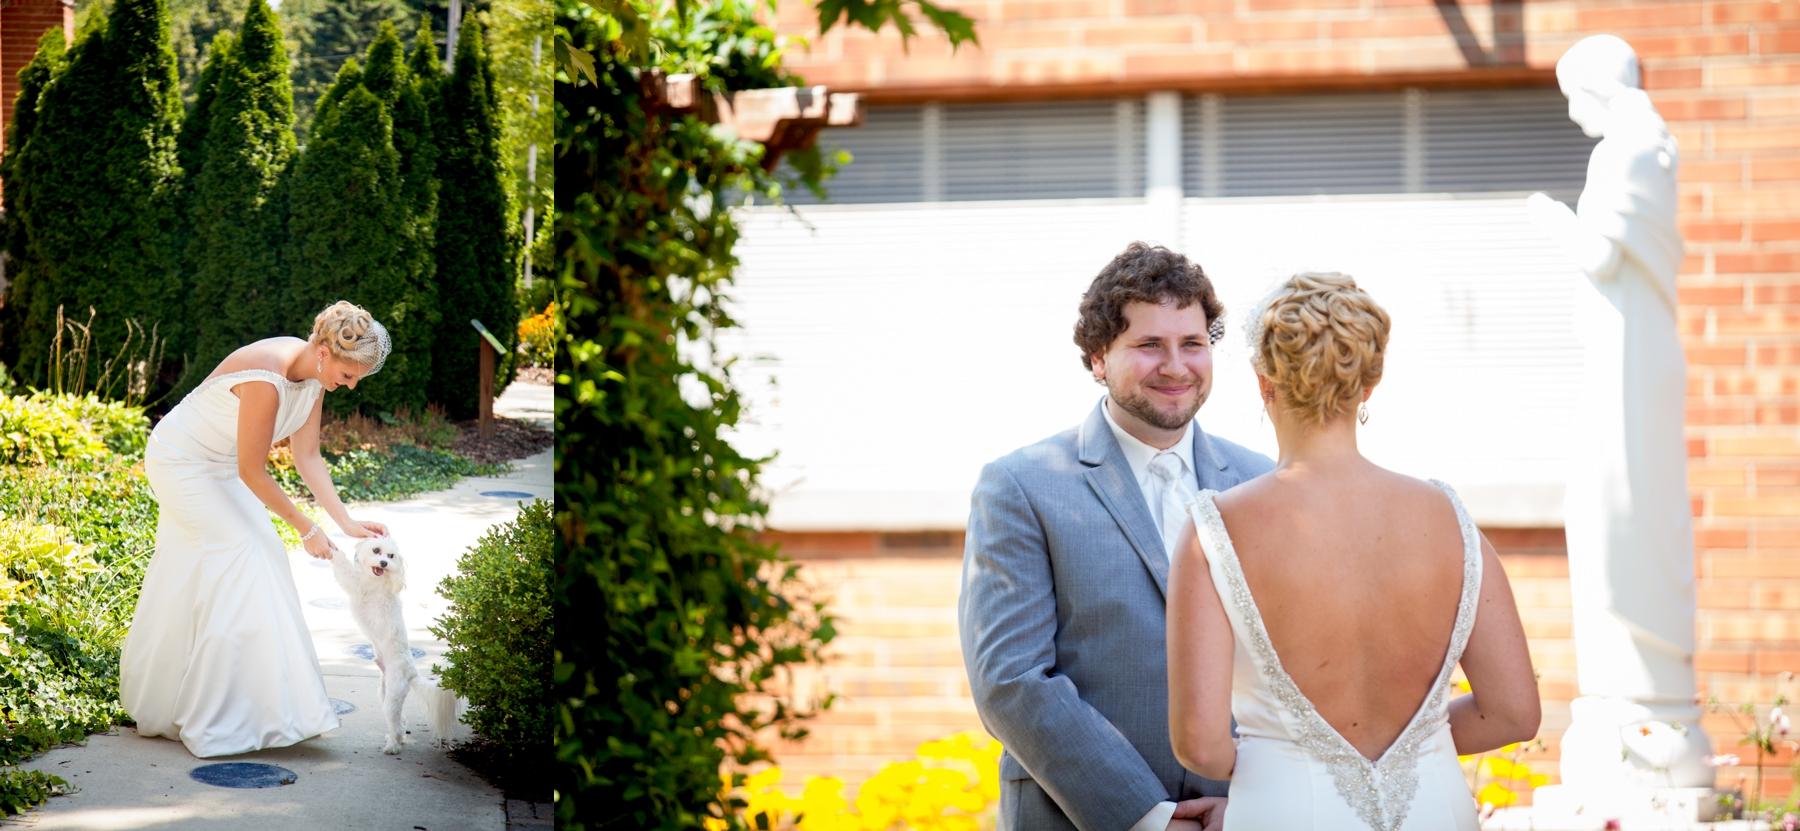 Brandon_Shafer_Photography_Chris_Lauren_Michigan_State_Capital_Wedding_0014.jpg